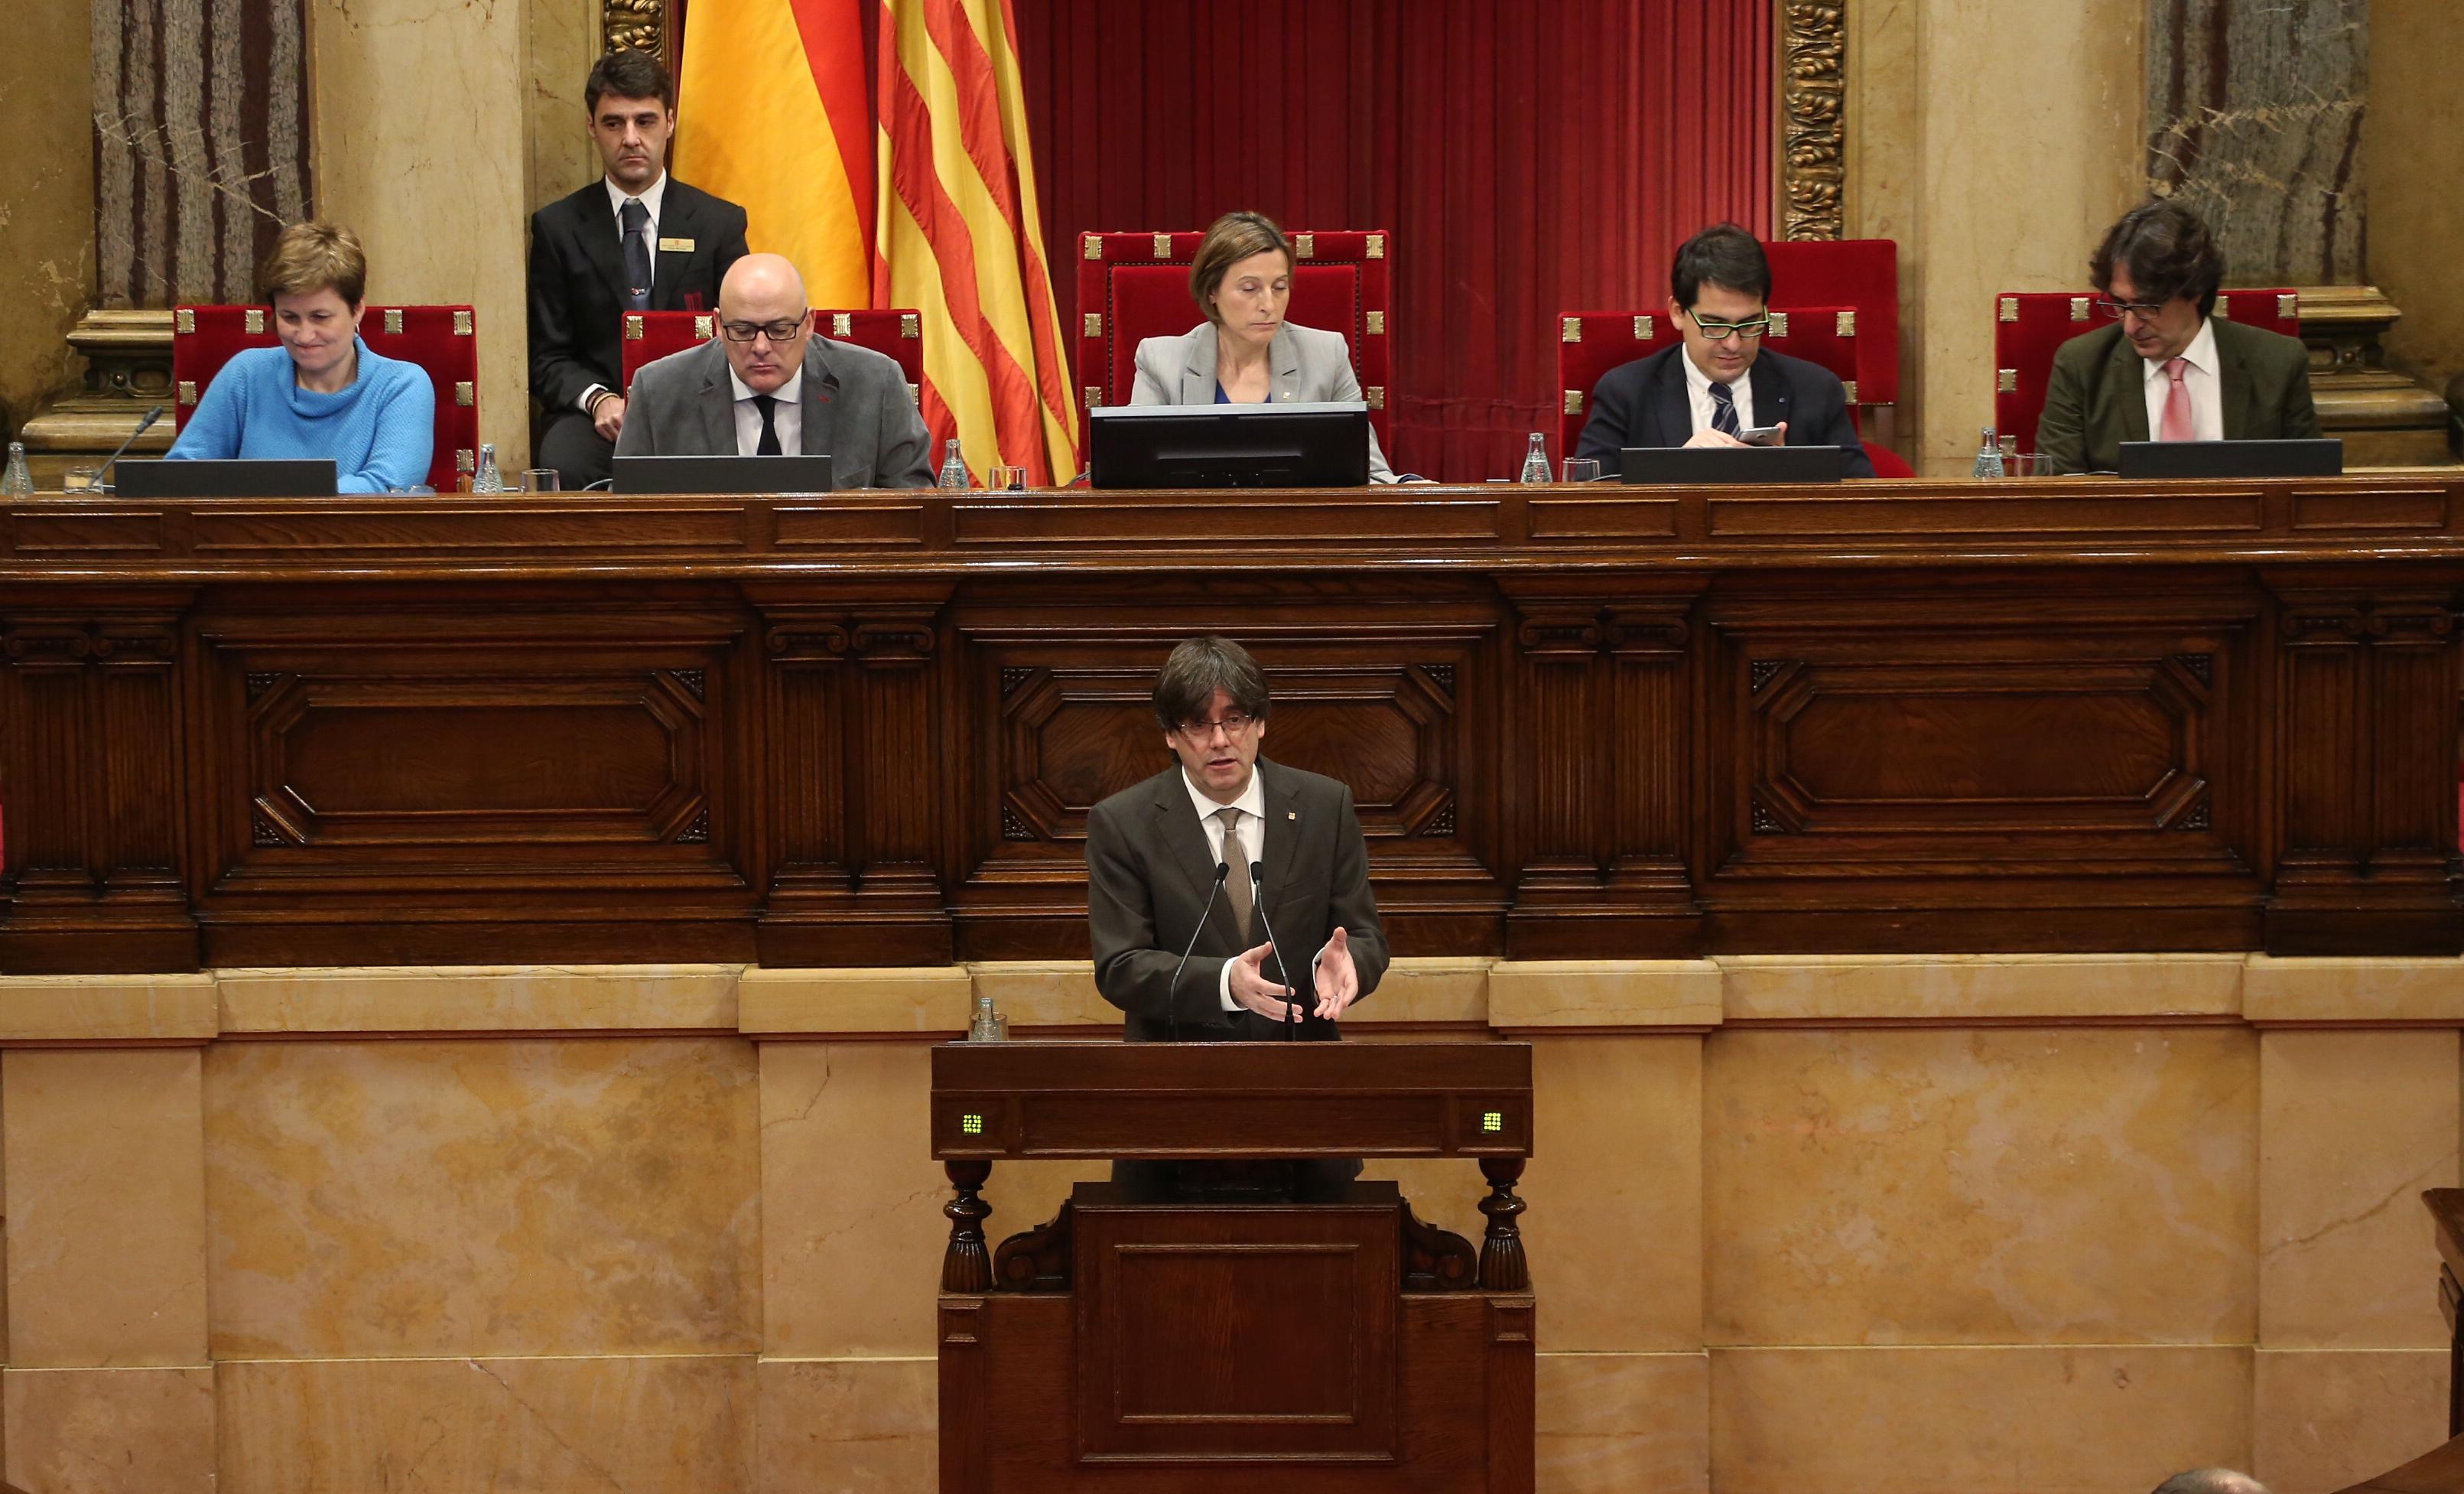 https://upload.wikimedia.org/wikipedia/commons/6/62/Fotografia_del_president_Puigdemont_durant_la_seva_intervenci%C3%B3_al_Parlament.JPG